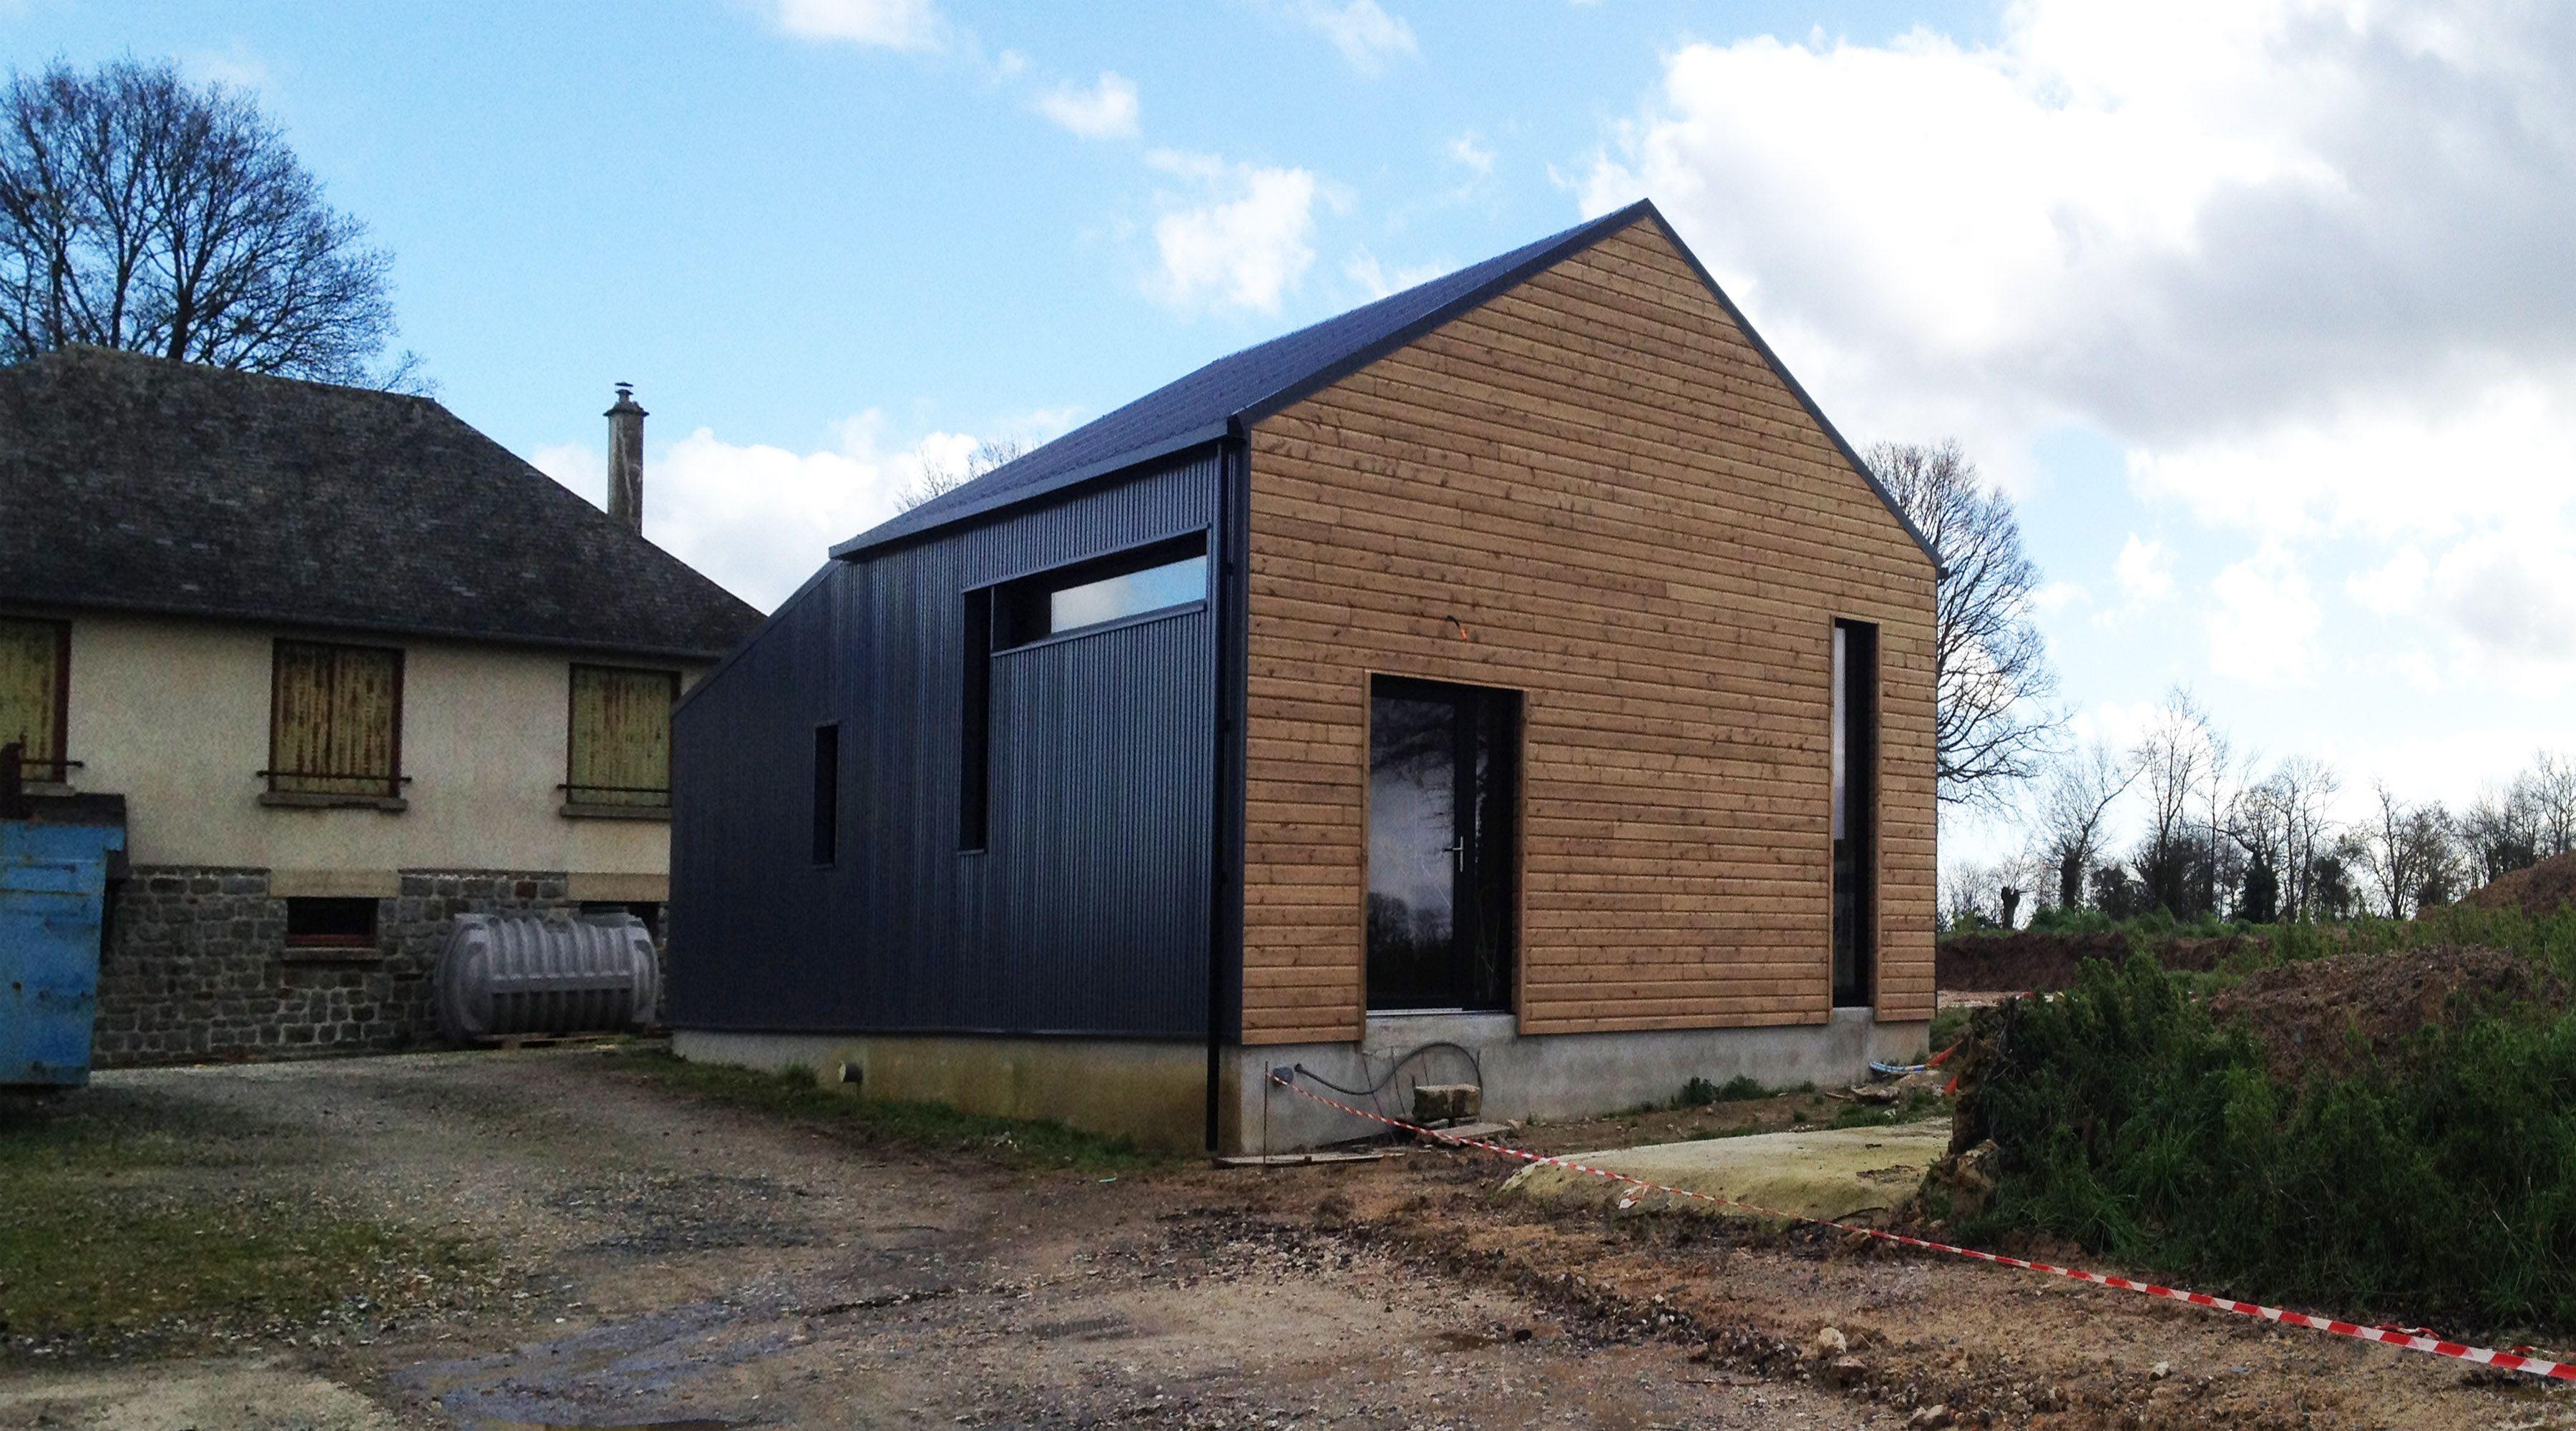 projet m bardage pinterest architecture bois maison. Black Bedroom Furniture Sets. Home Design Ideas